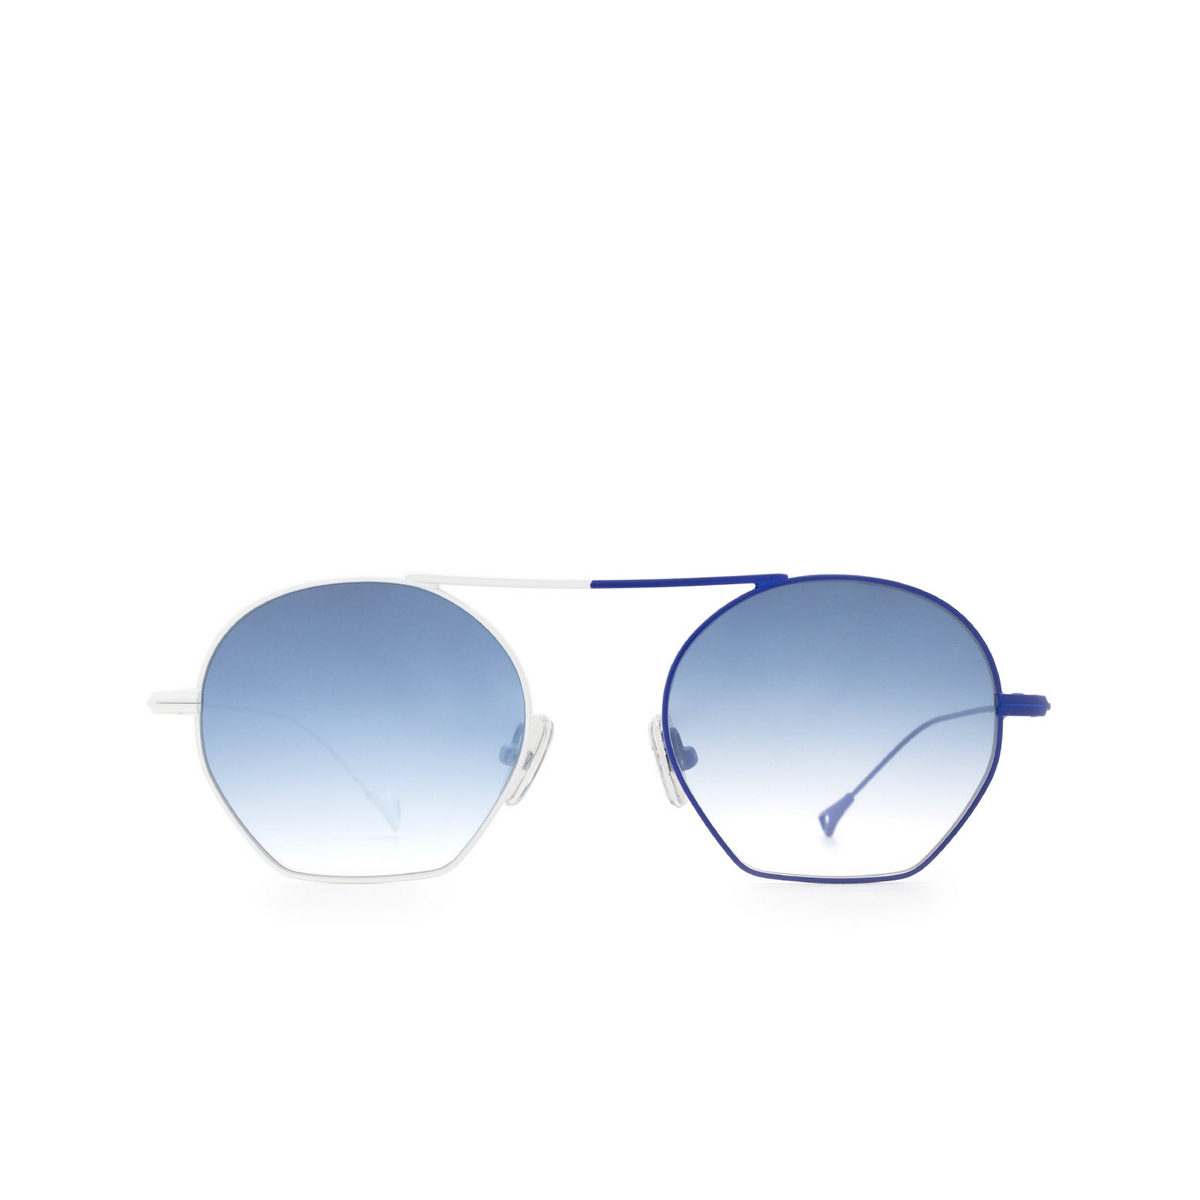 Eyepetizer® Irregular Sunglasses: Botafoch color White & Blue C.19-12F - front view.